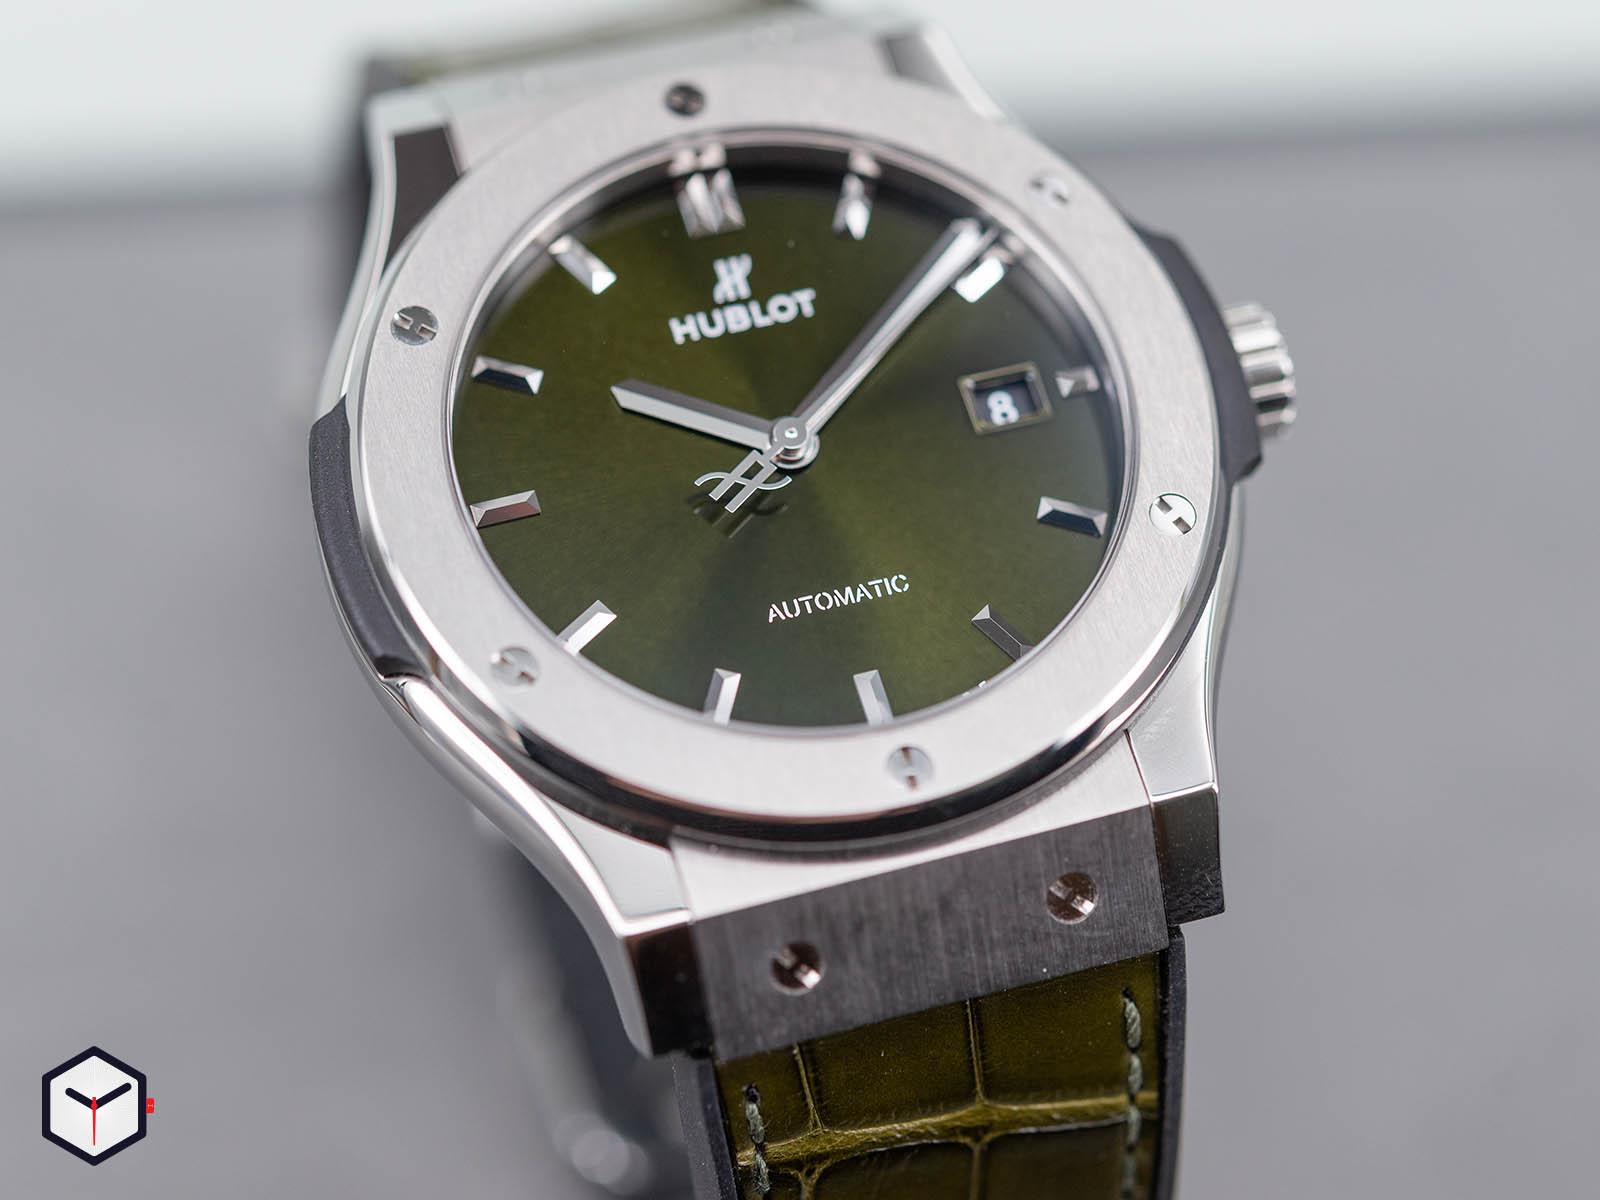 565-nx-8970-lr-hublot-classic-fusion-green-titanium-38mm-2.jpg